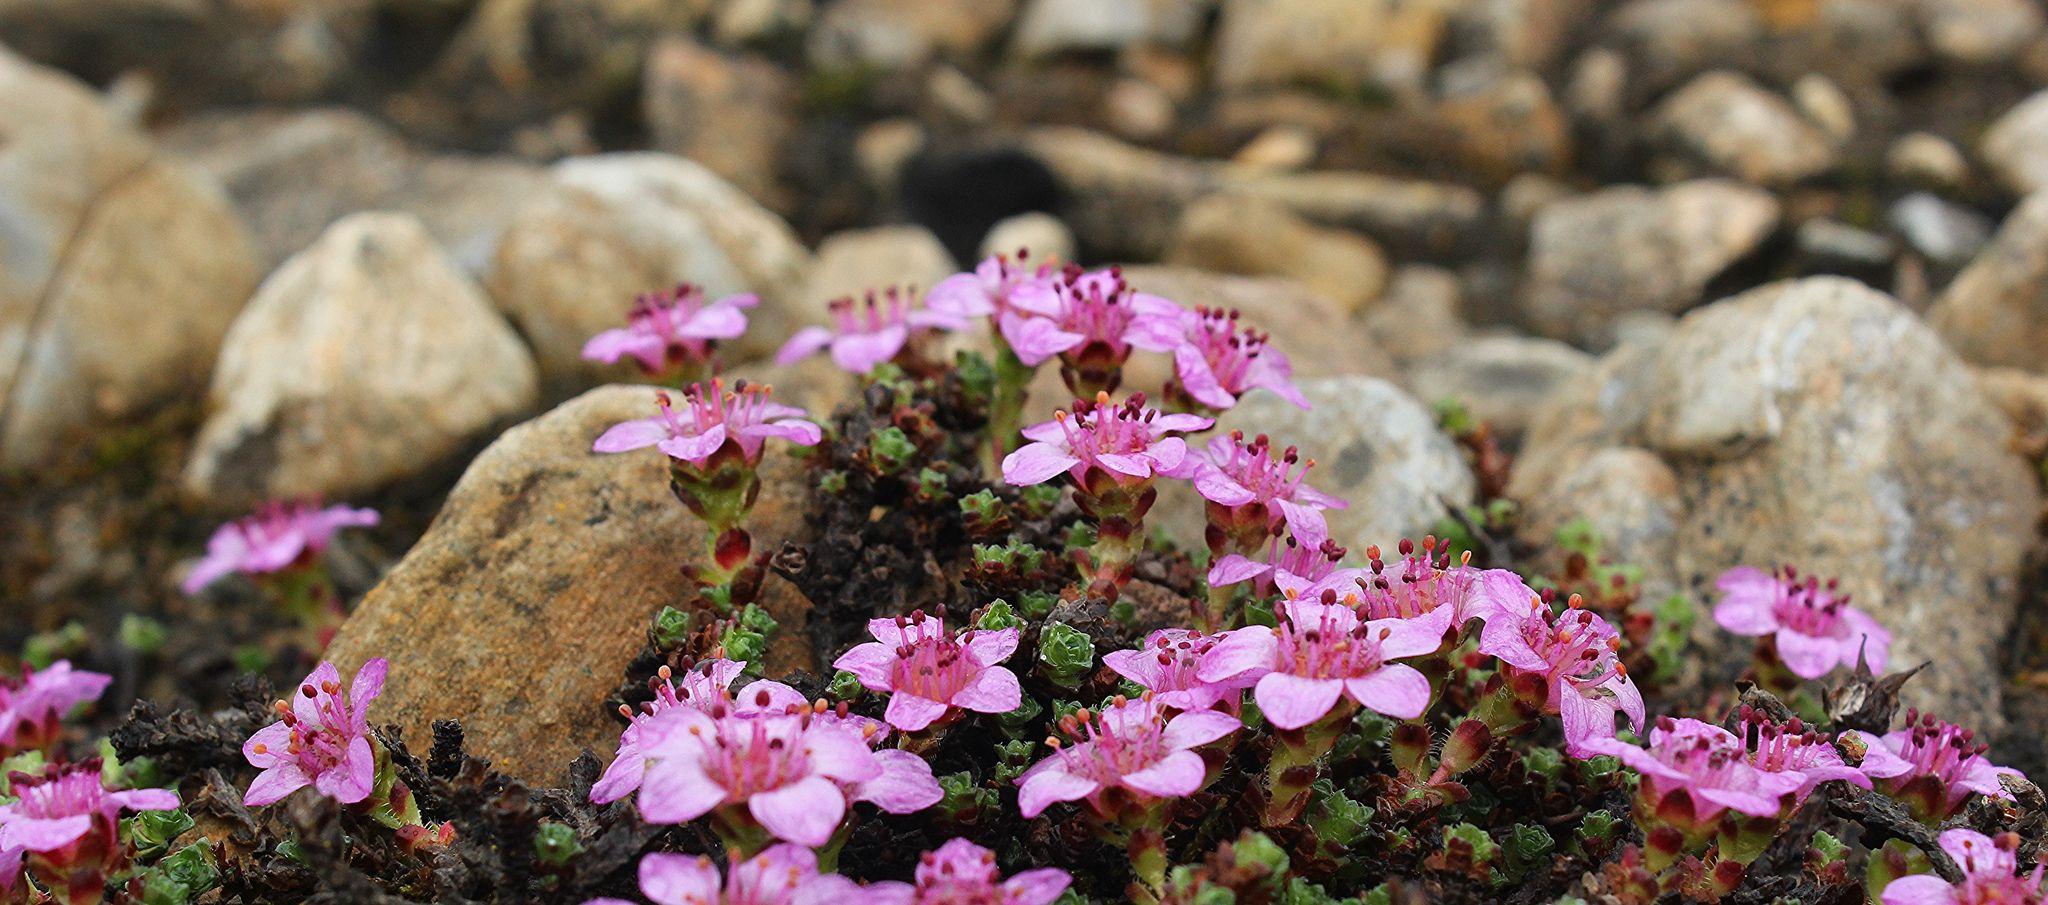 Purple Saxifrage Growing On The Tundra Tundra, Plants